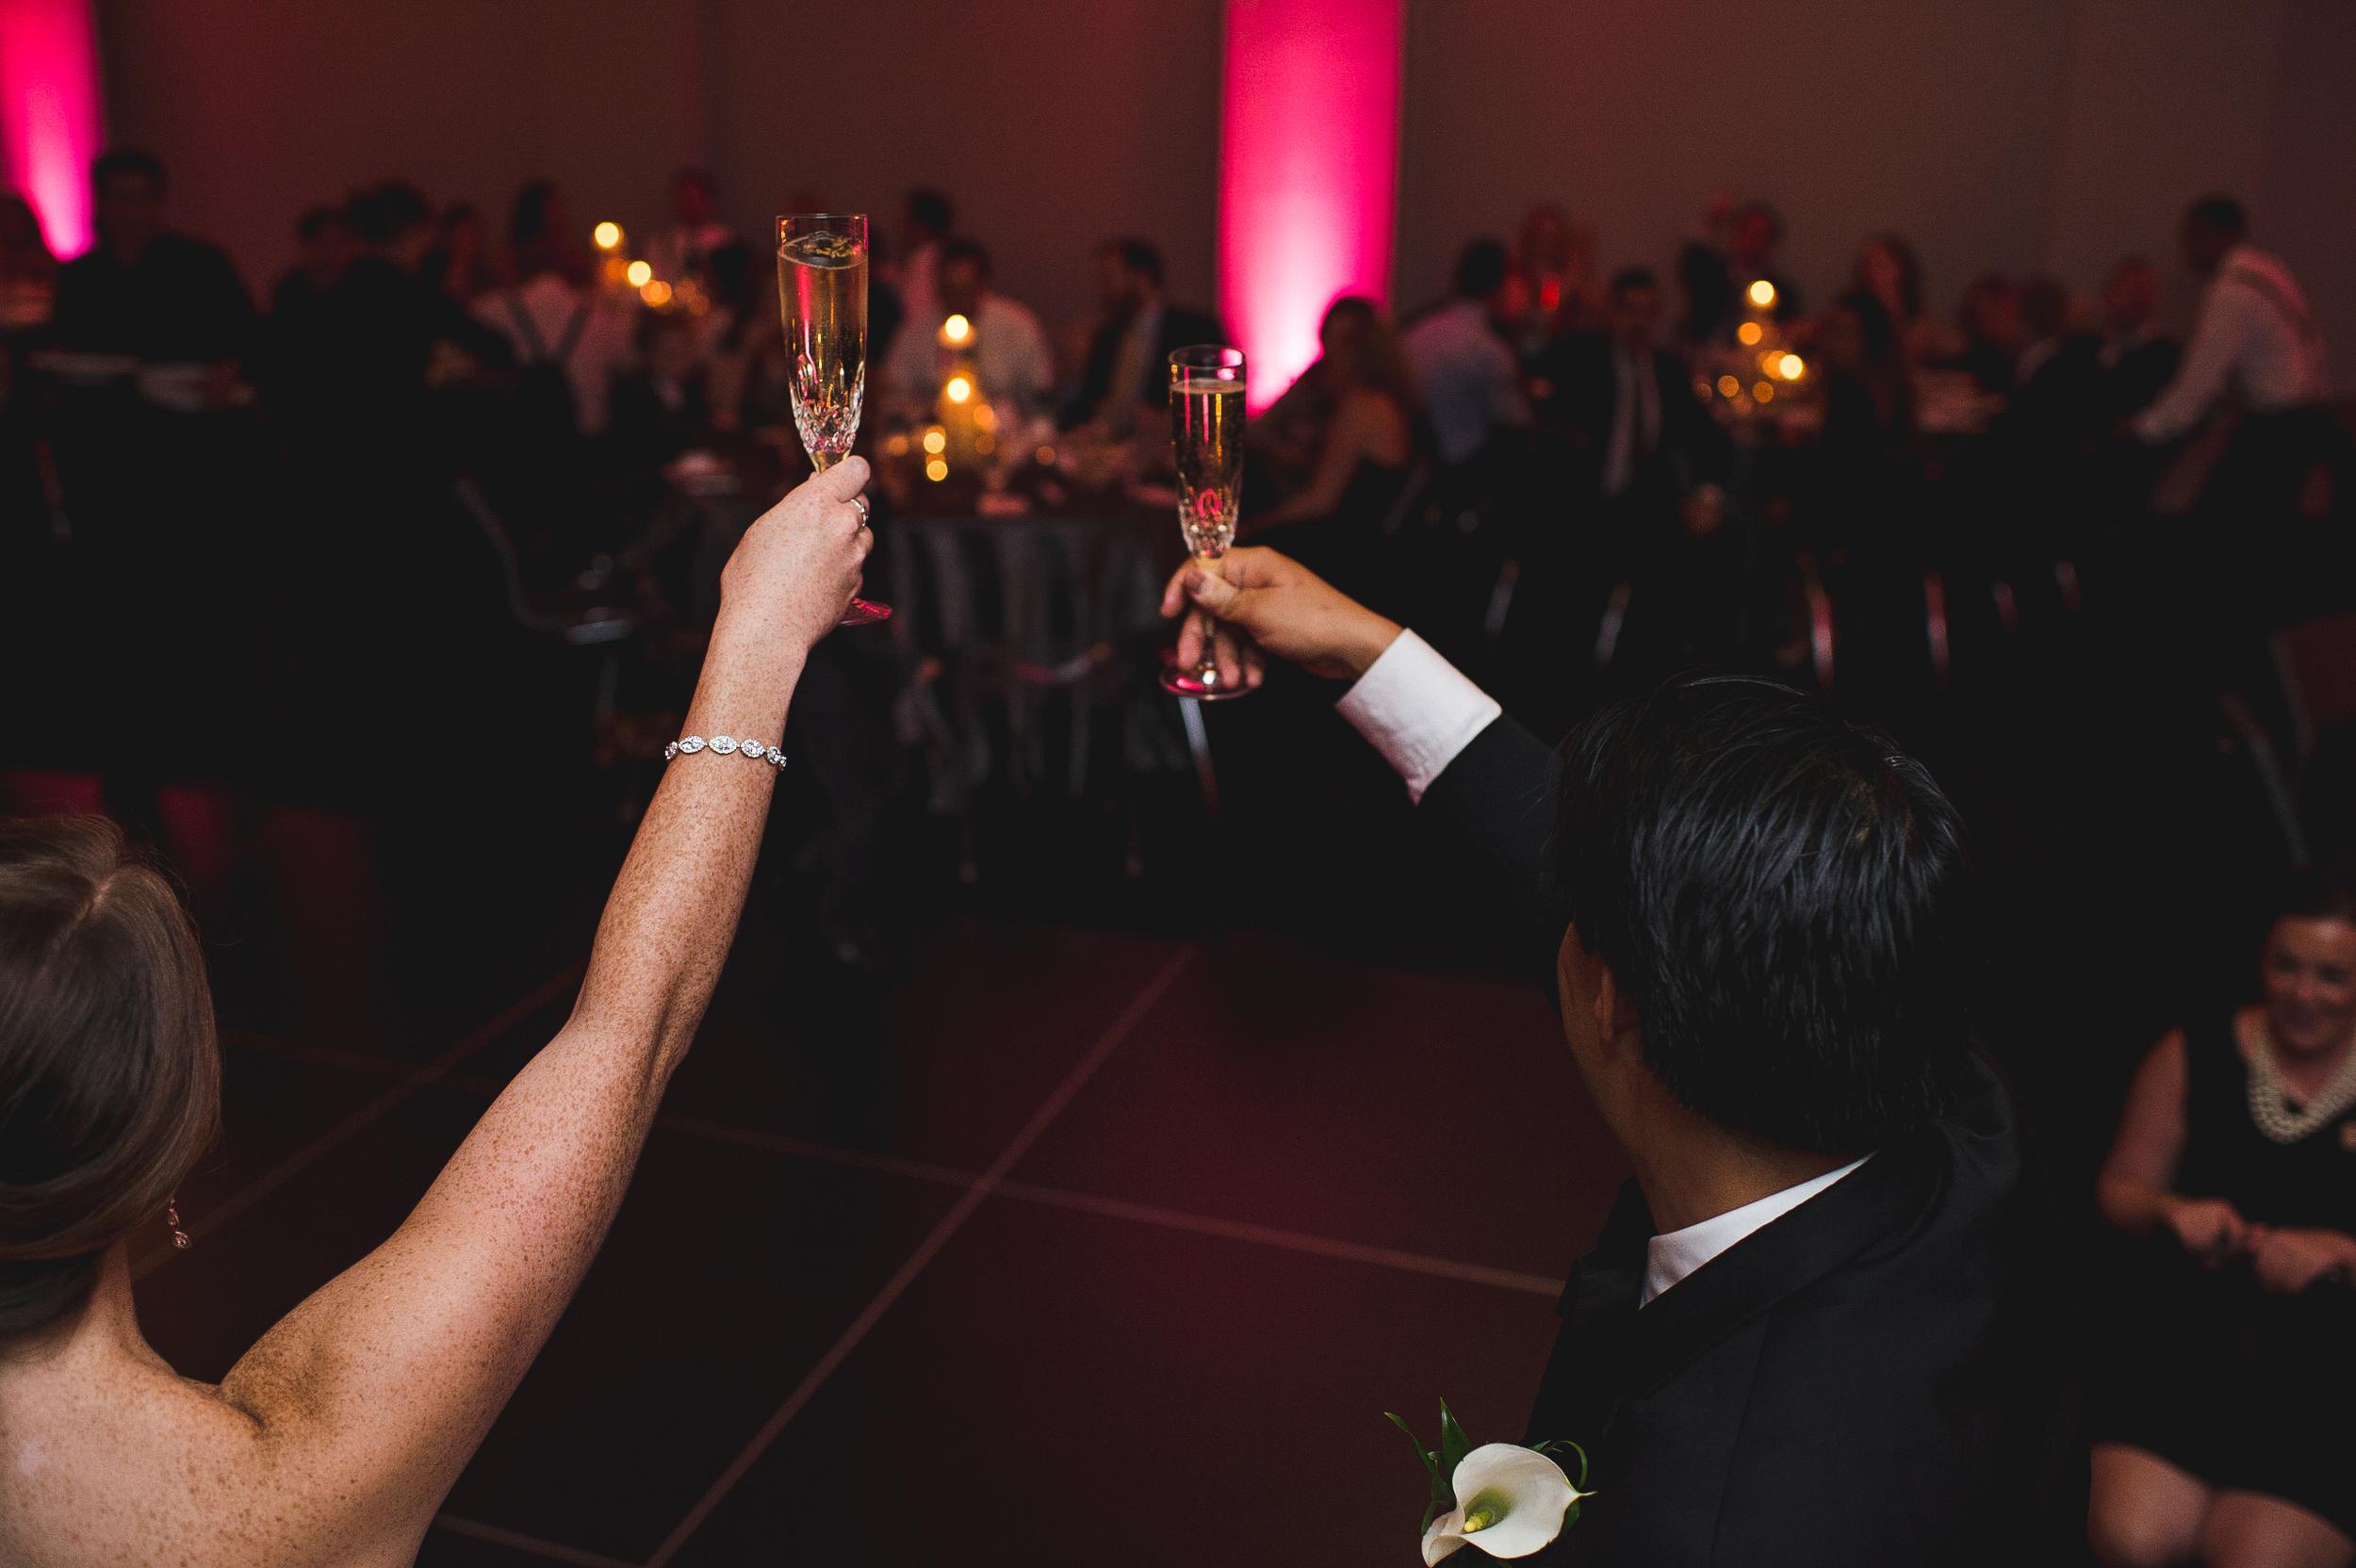 Wedding at W Hotel Washington DC by Mantas Kubilinskas-22.jpg